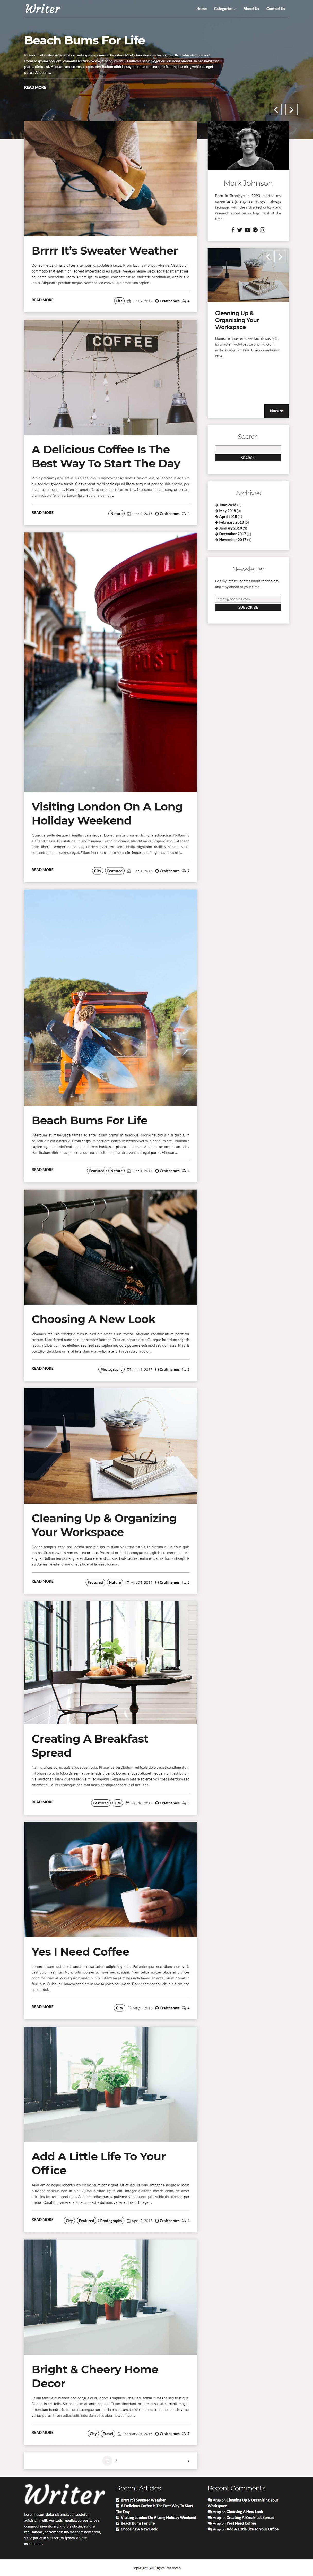 writer blog best free minimal wordpress theme - 10+ Best Free Minimal WordPress Themes